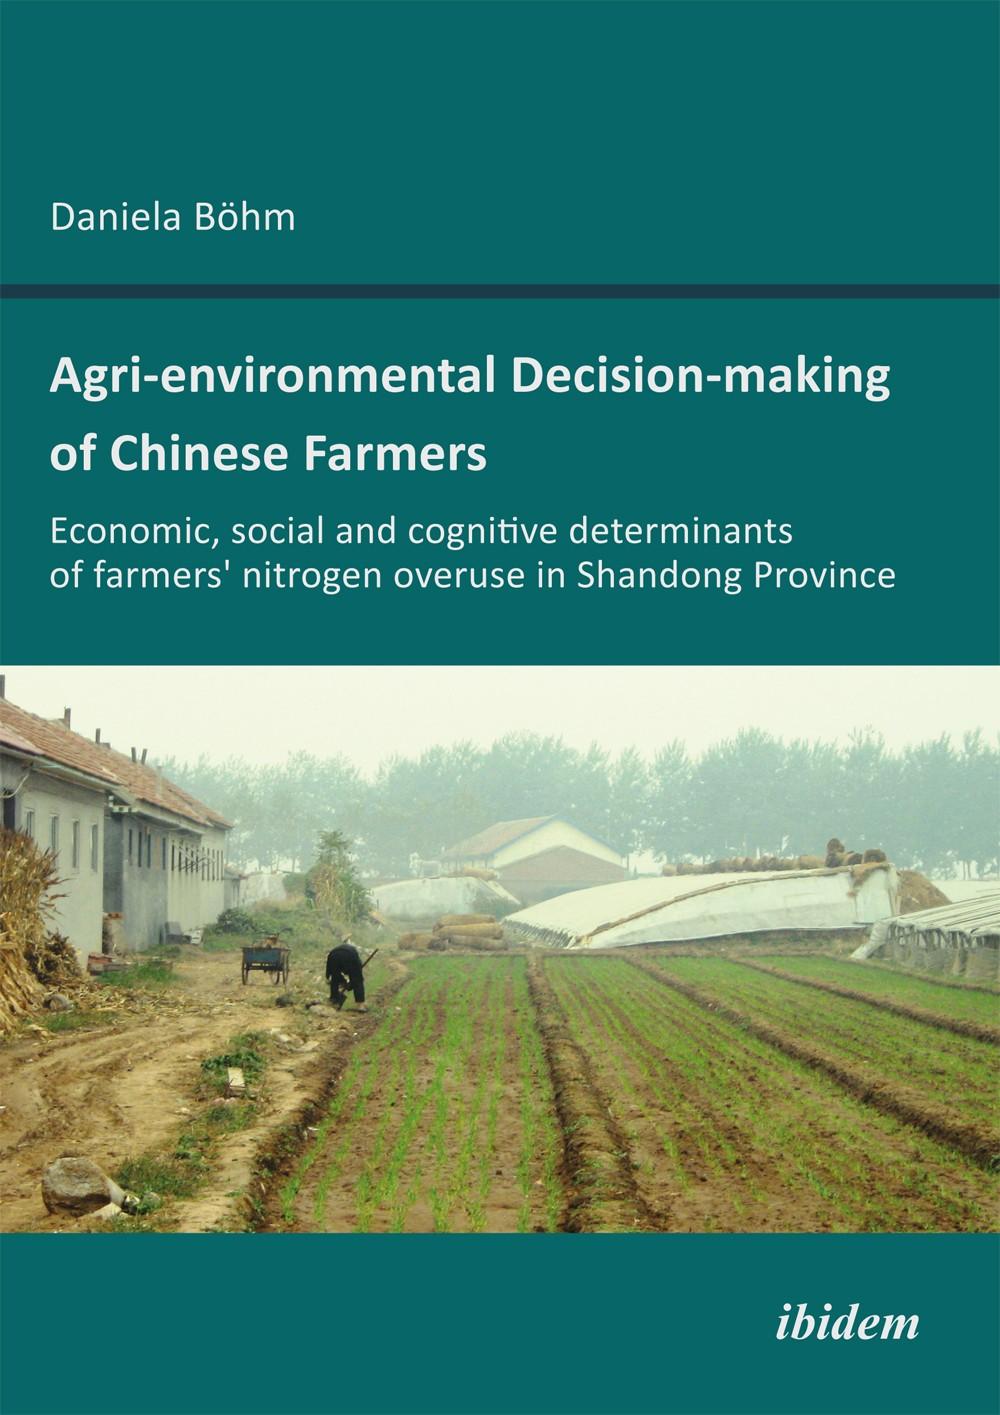 Agri-environmental Decision-making of Chinese Farmers